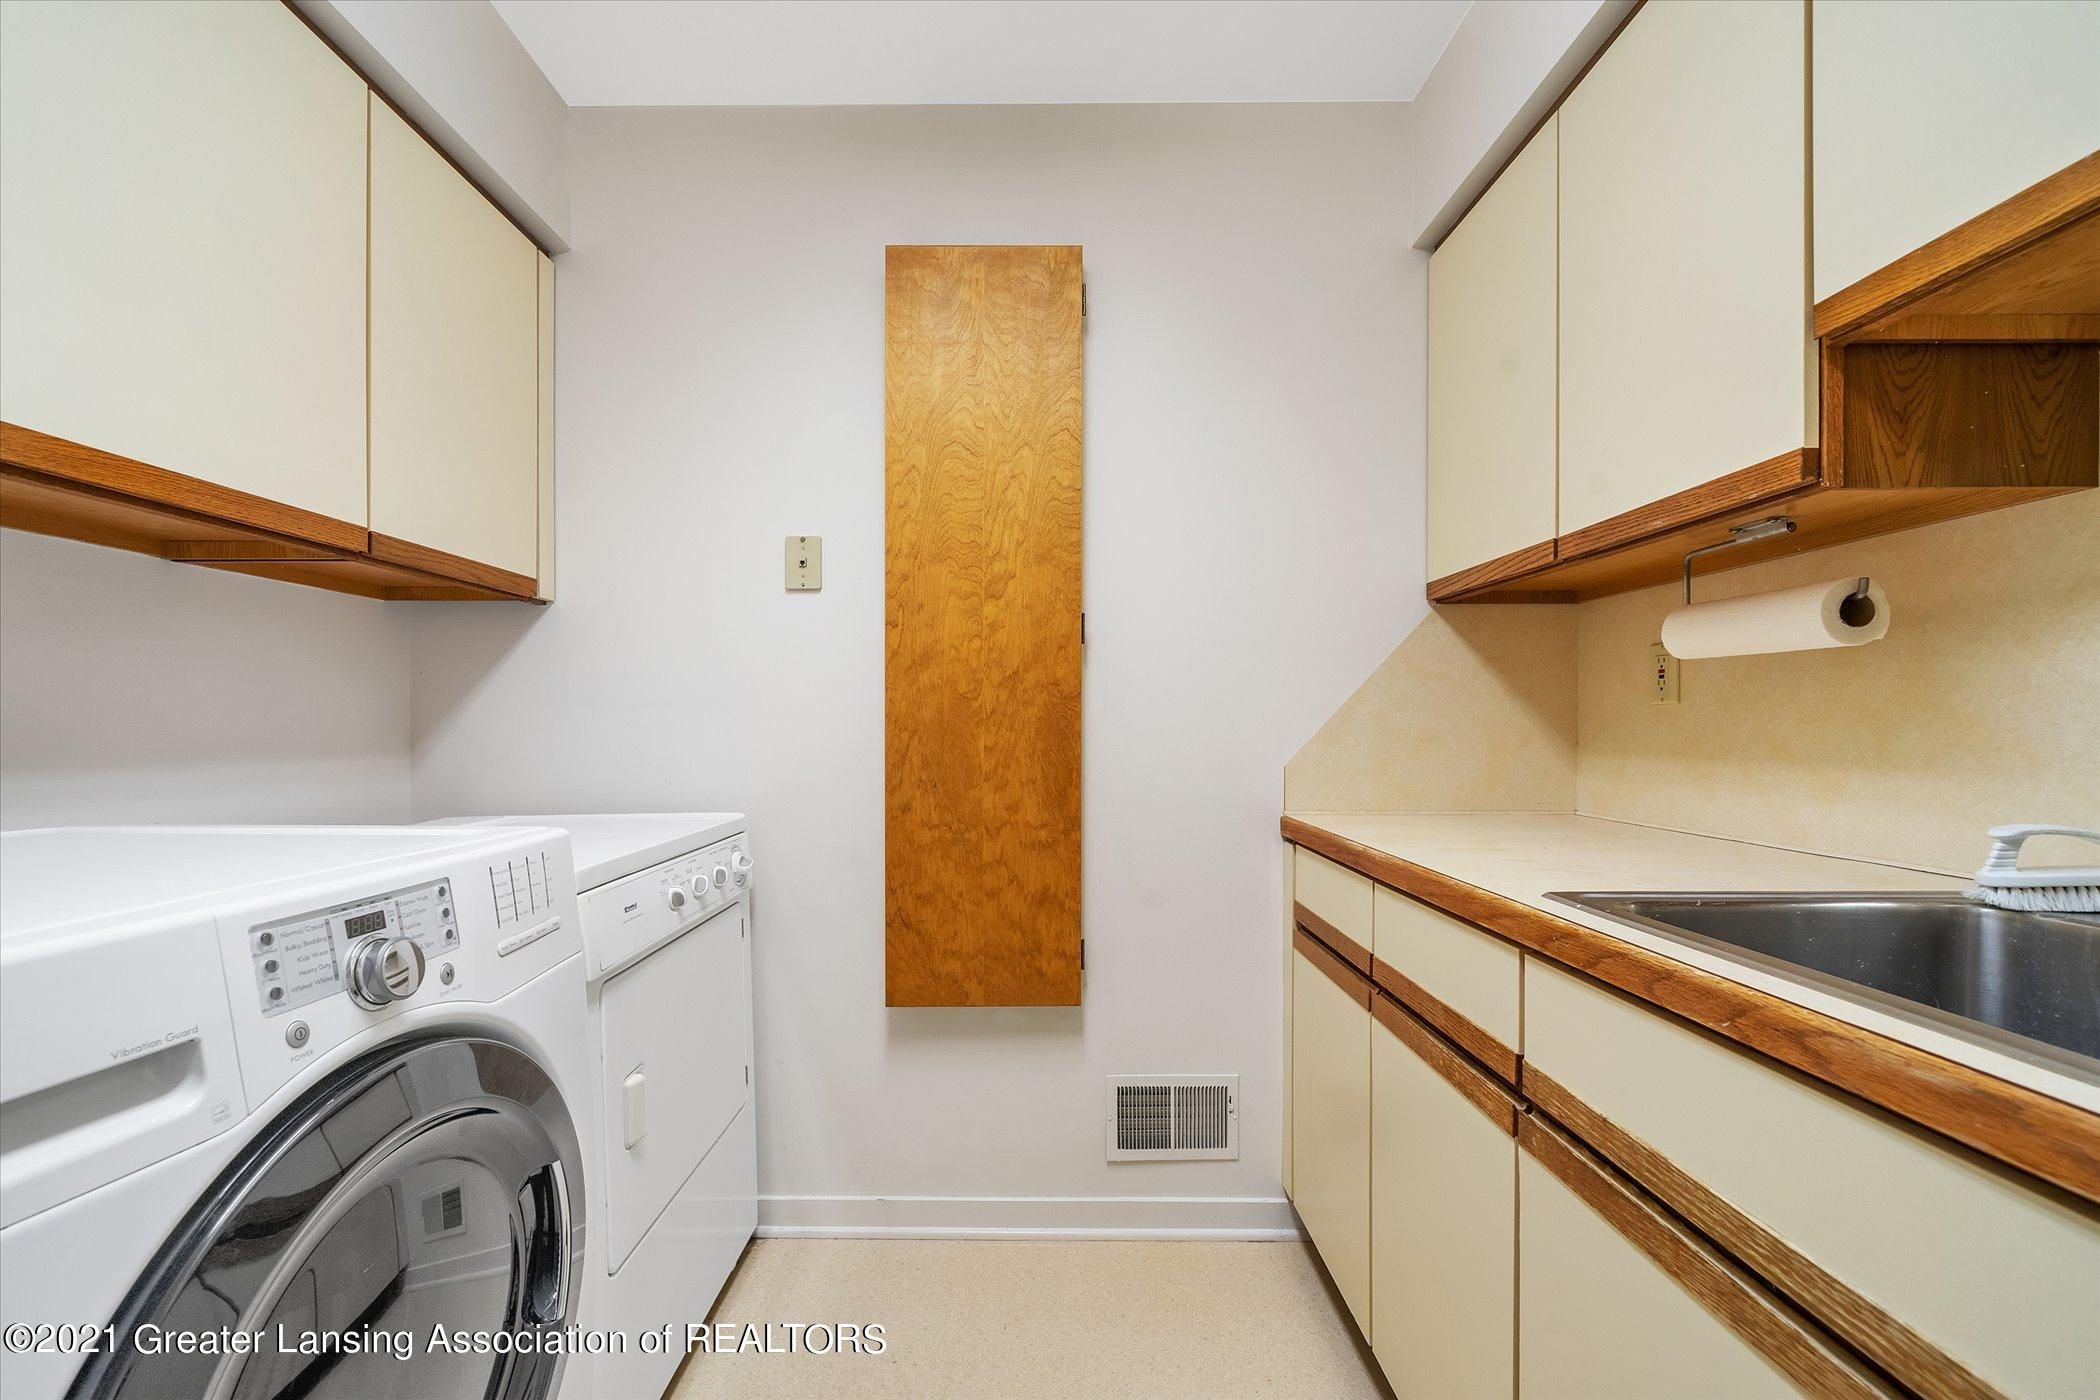 442 Shoesmith Rd - (33) MAIN FLOOR Laundry Room - 34